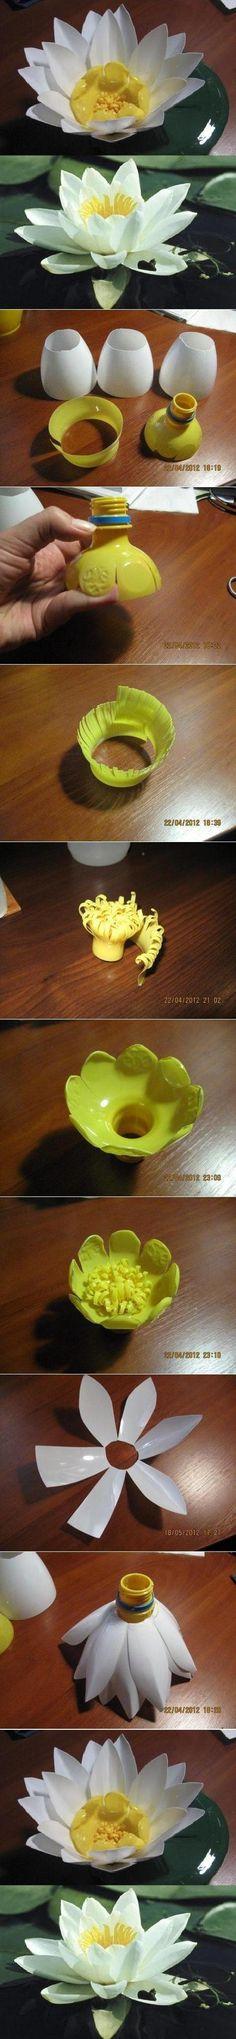 DIY Plastic Bottle Lily Flower DIY Plastic Bottle Lily Flower